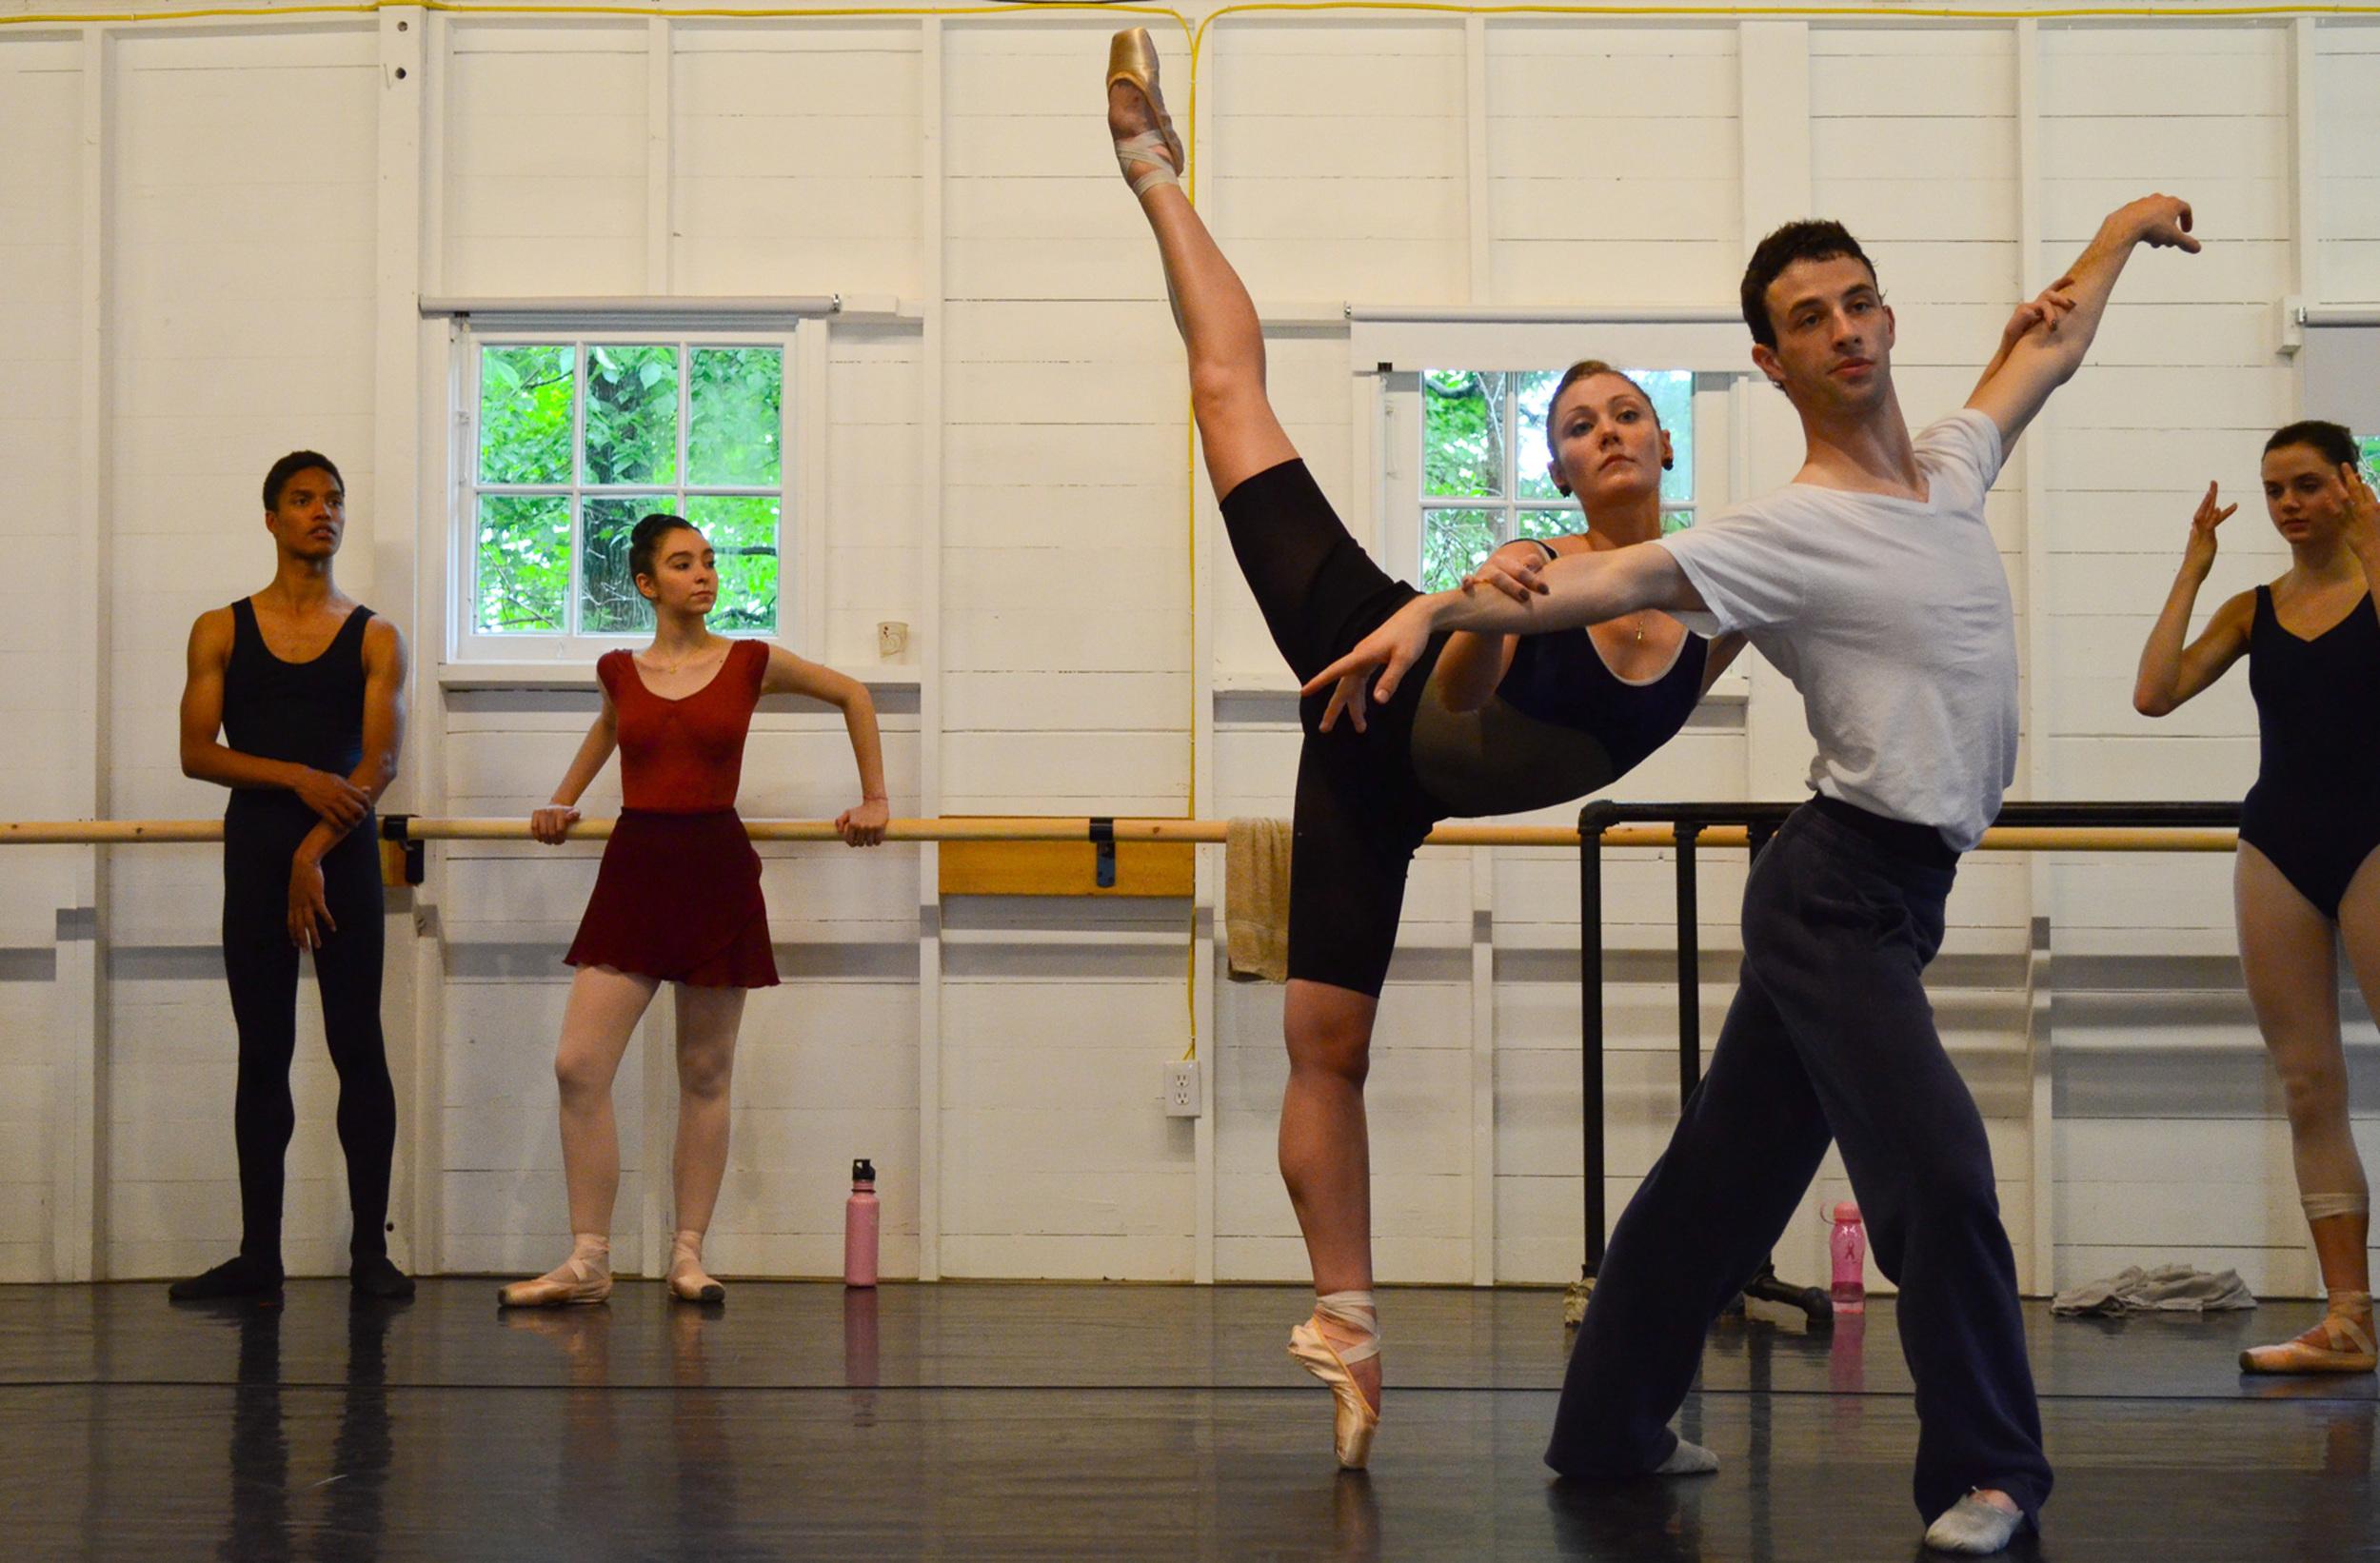 h_BalletProgram2011_TheSchoolAtJacobsPillow_courtesyJacobsPillowDance_photoCherylynnTsushima_005.jpg